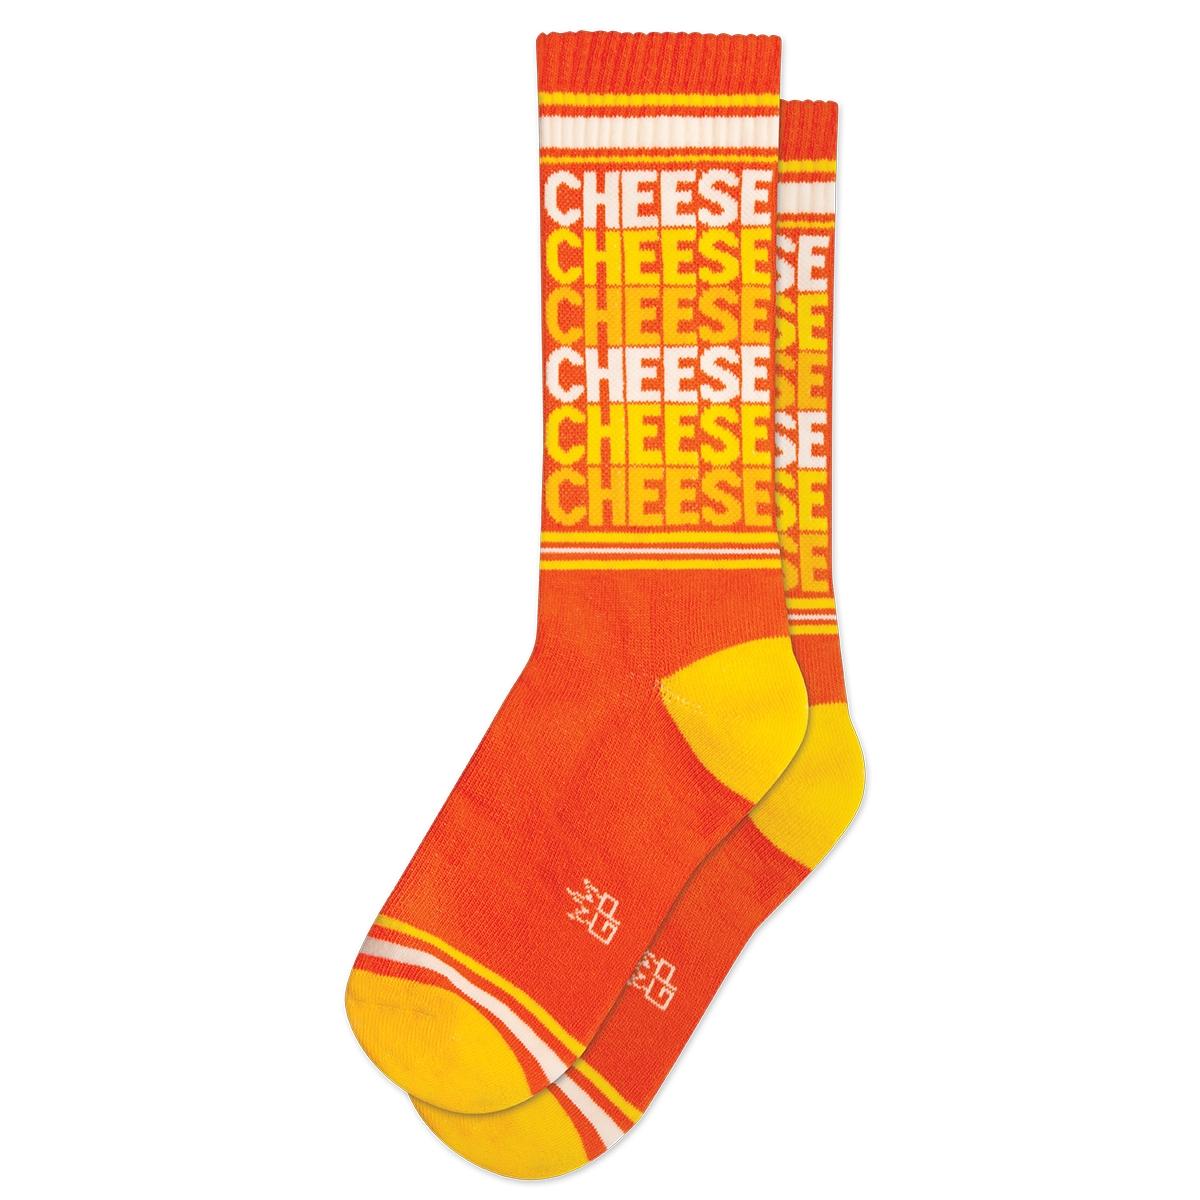 Cheese Socks